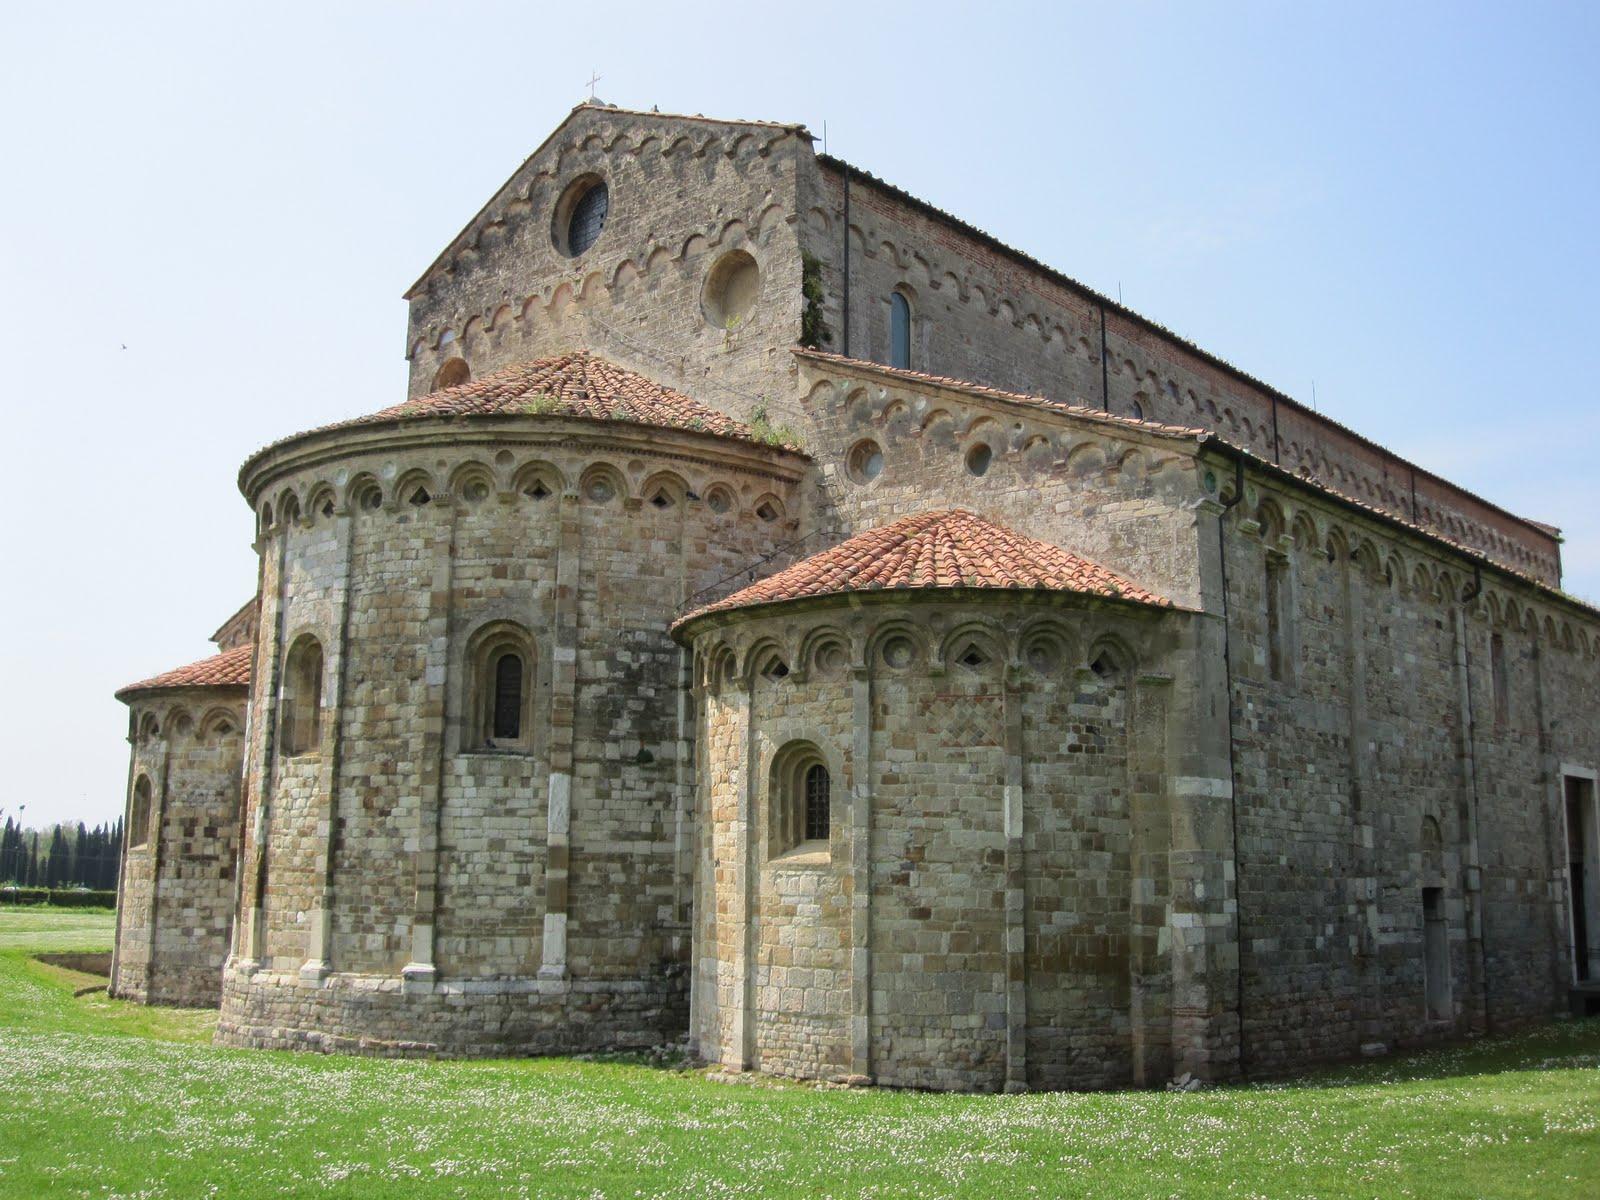 70 - Basíllica de San Piero a Grado1